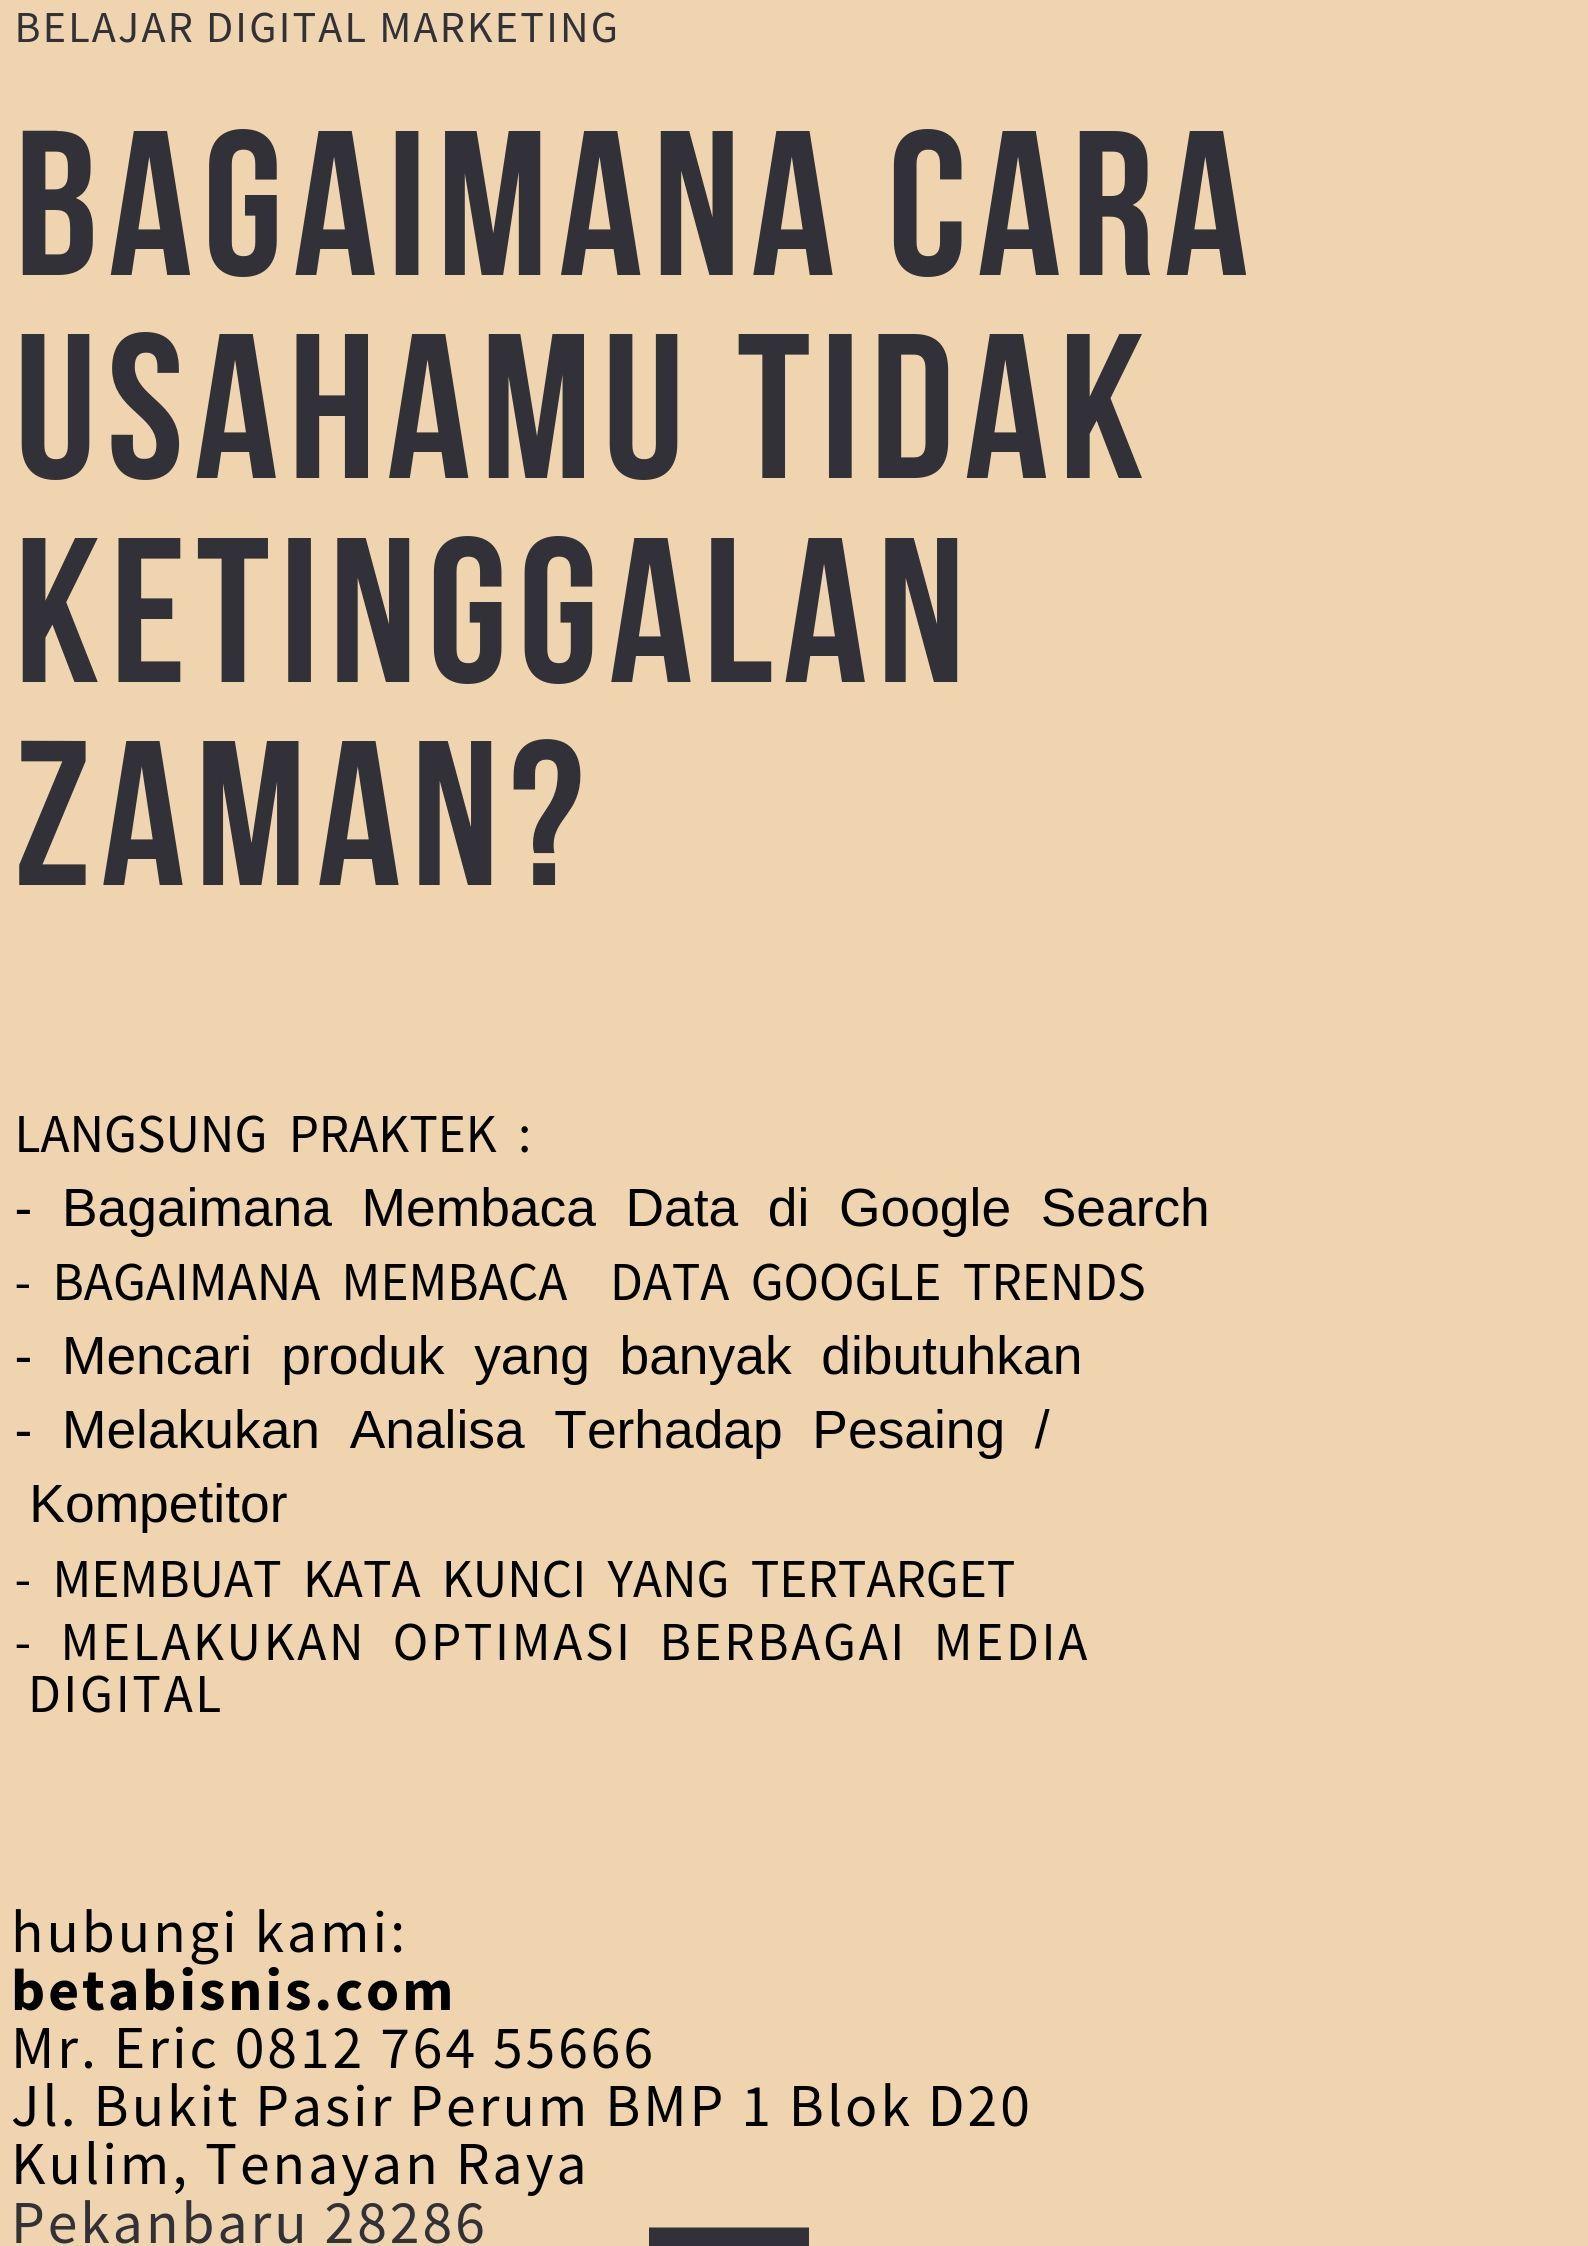 Tergampang Digital Marketing Tips Blog Pekanbaru Wa 0812 7645 5666 Programmatic Digital Marketing Marketing